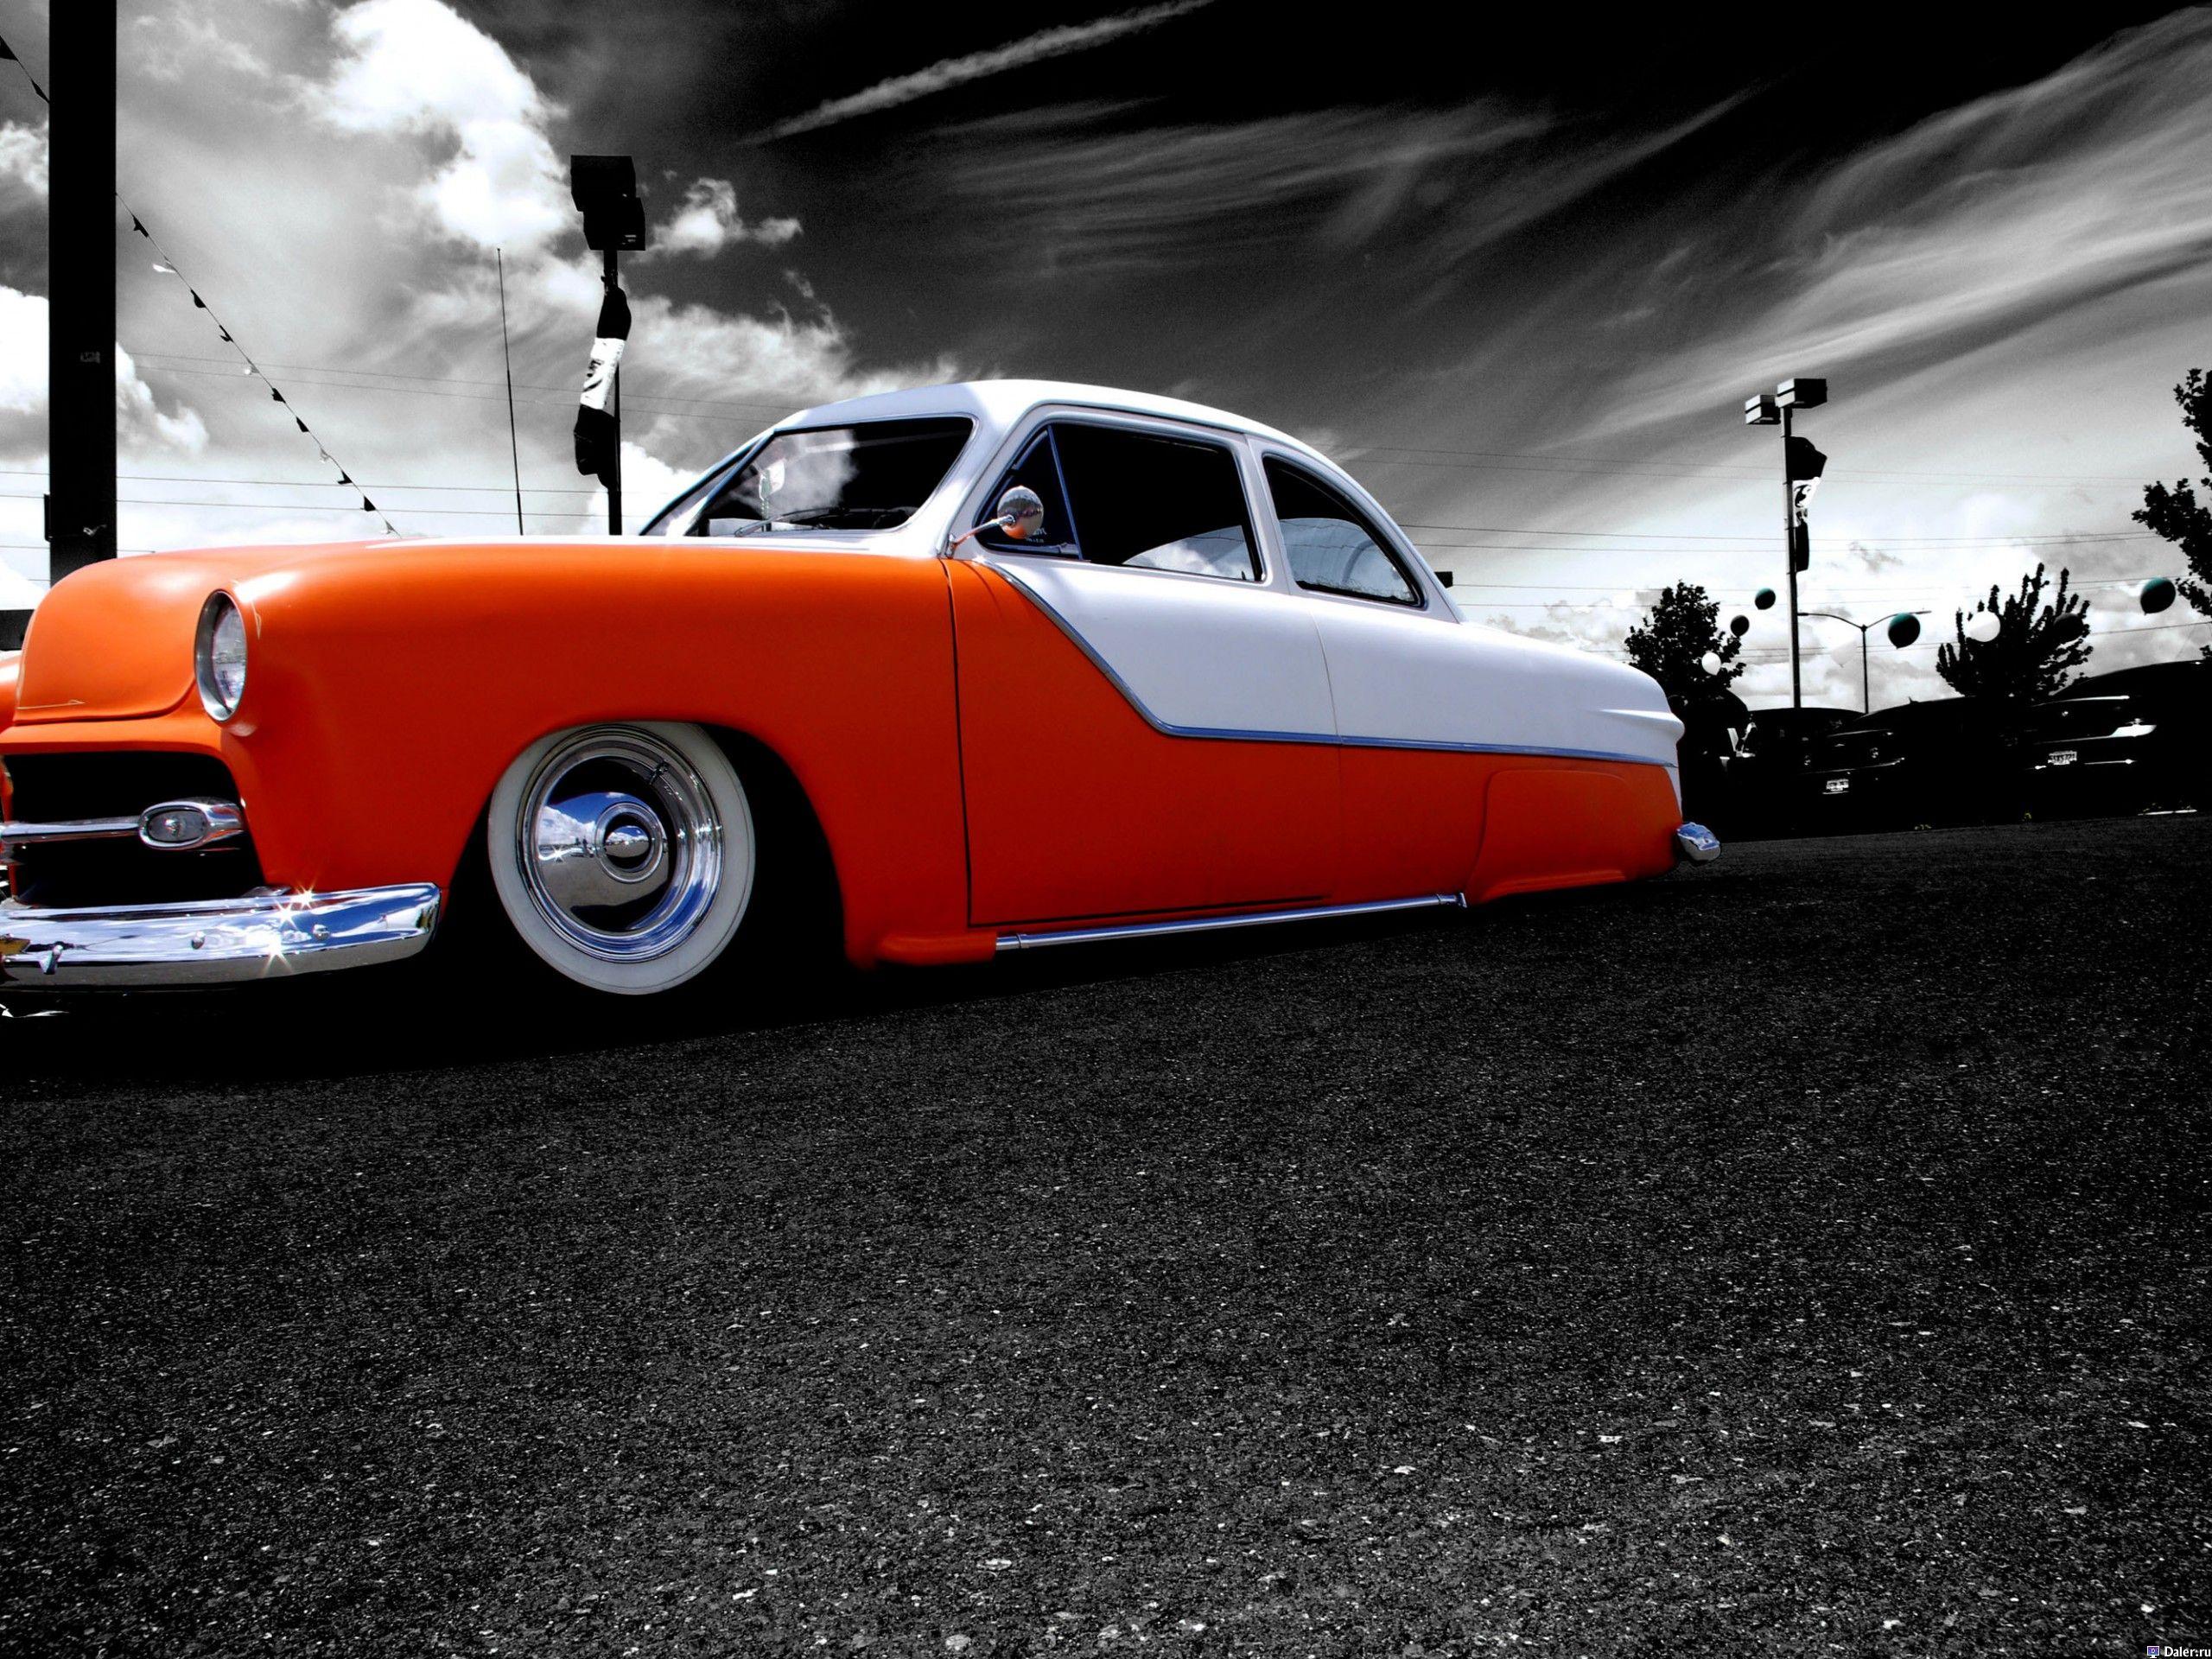 Old School Car | Cars | Pinterest | Cars, School and Wheels